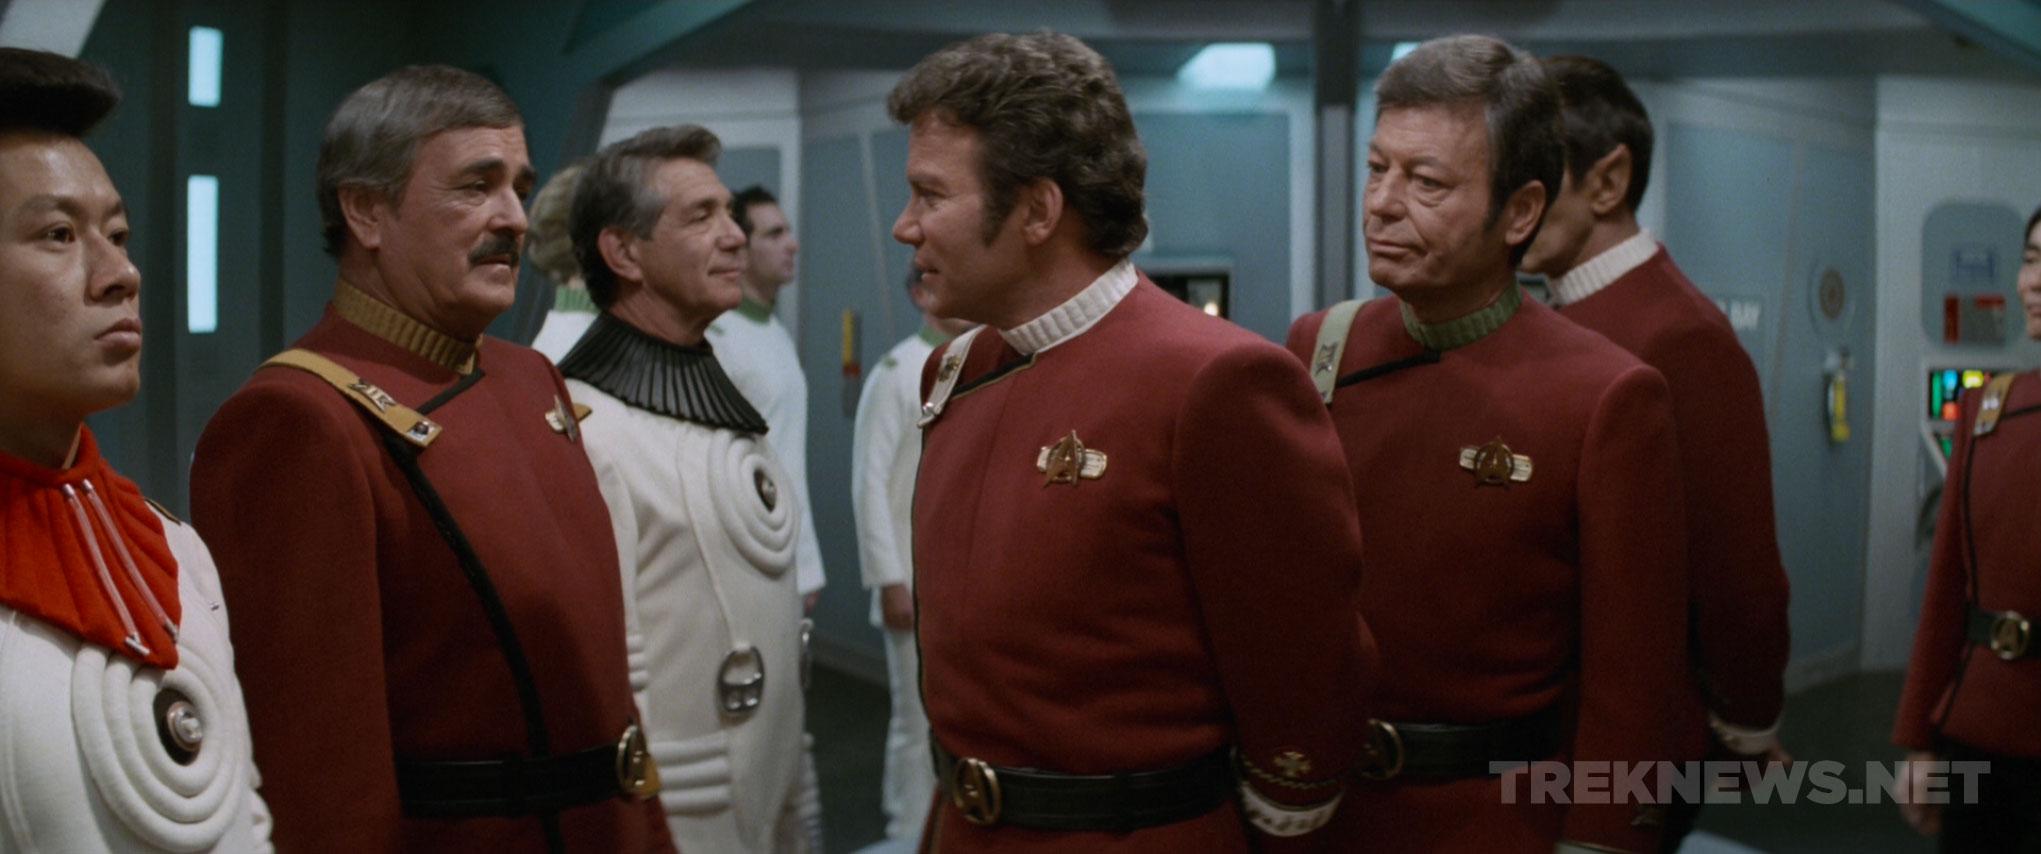 STAR TREK II: THE WRATH OF KHAN - The Director's Cut